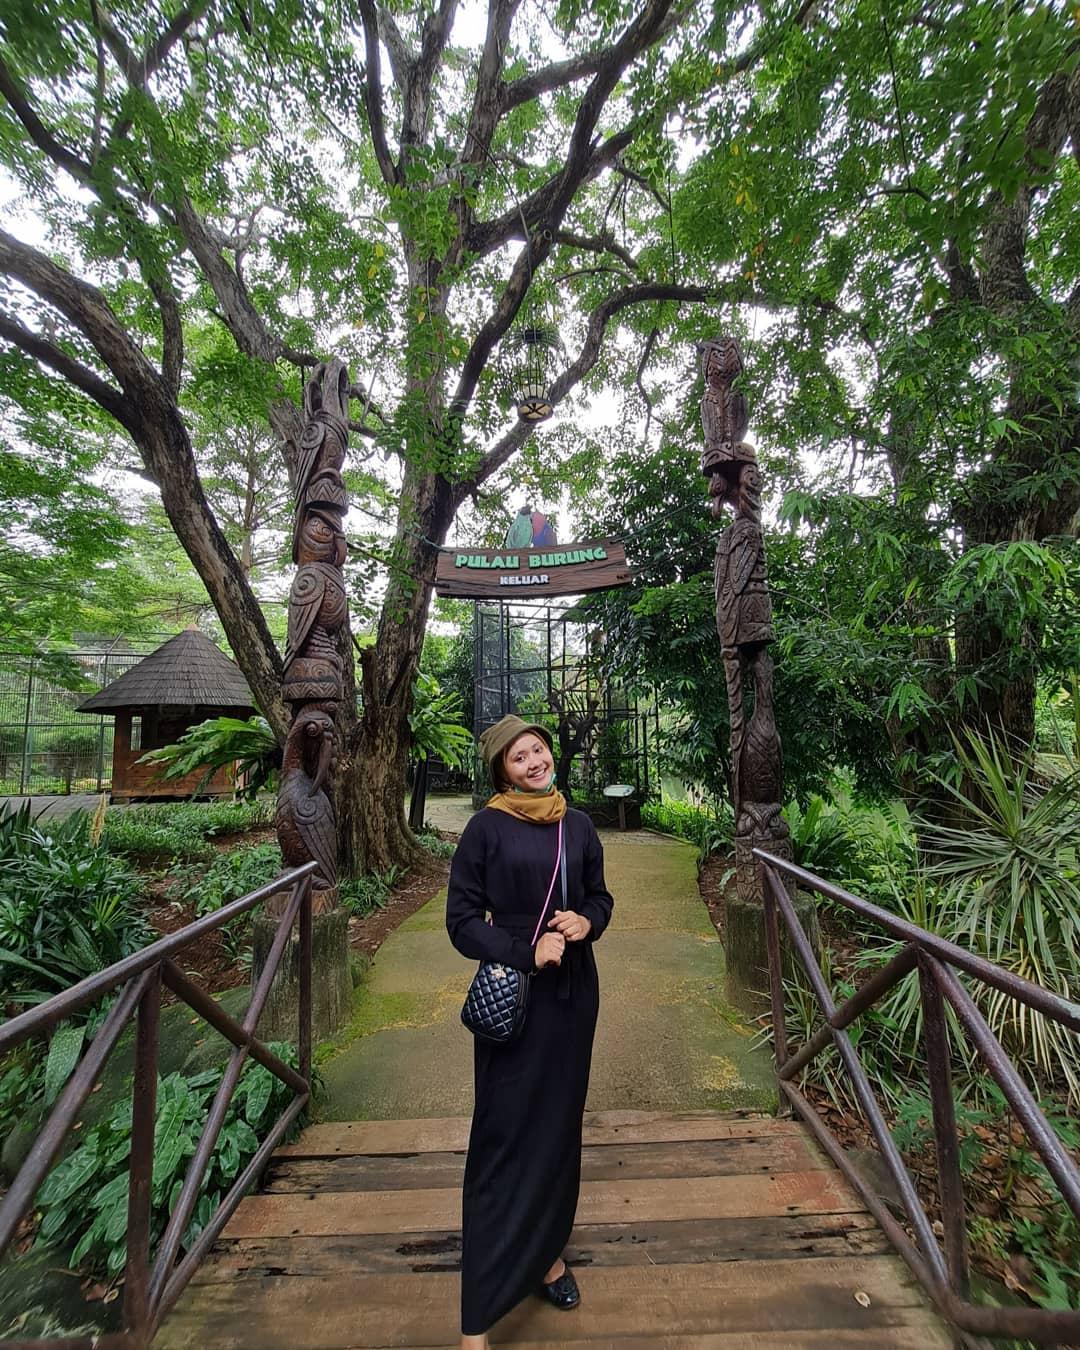 Hijaunya Pemandangan Di Faunaland Ancol Image From @qurniyaniia